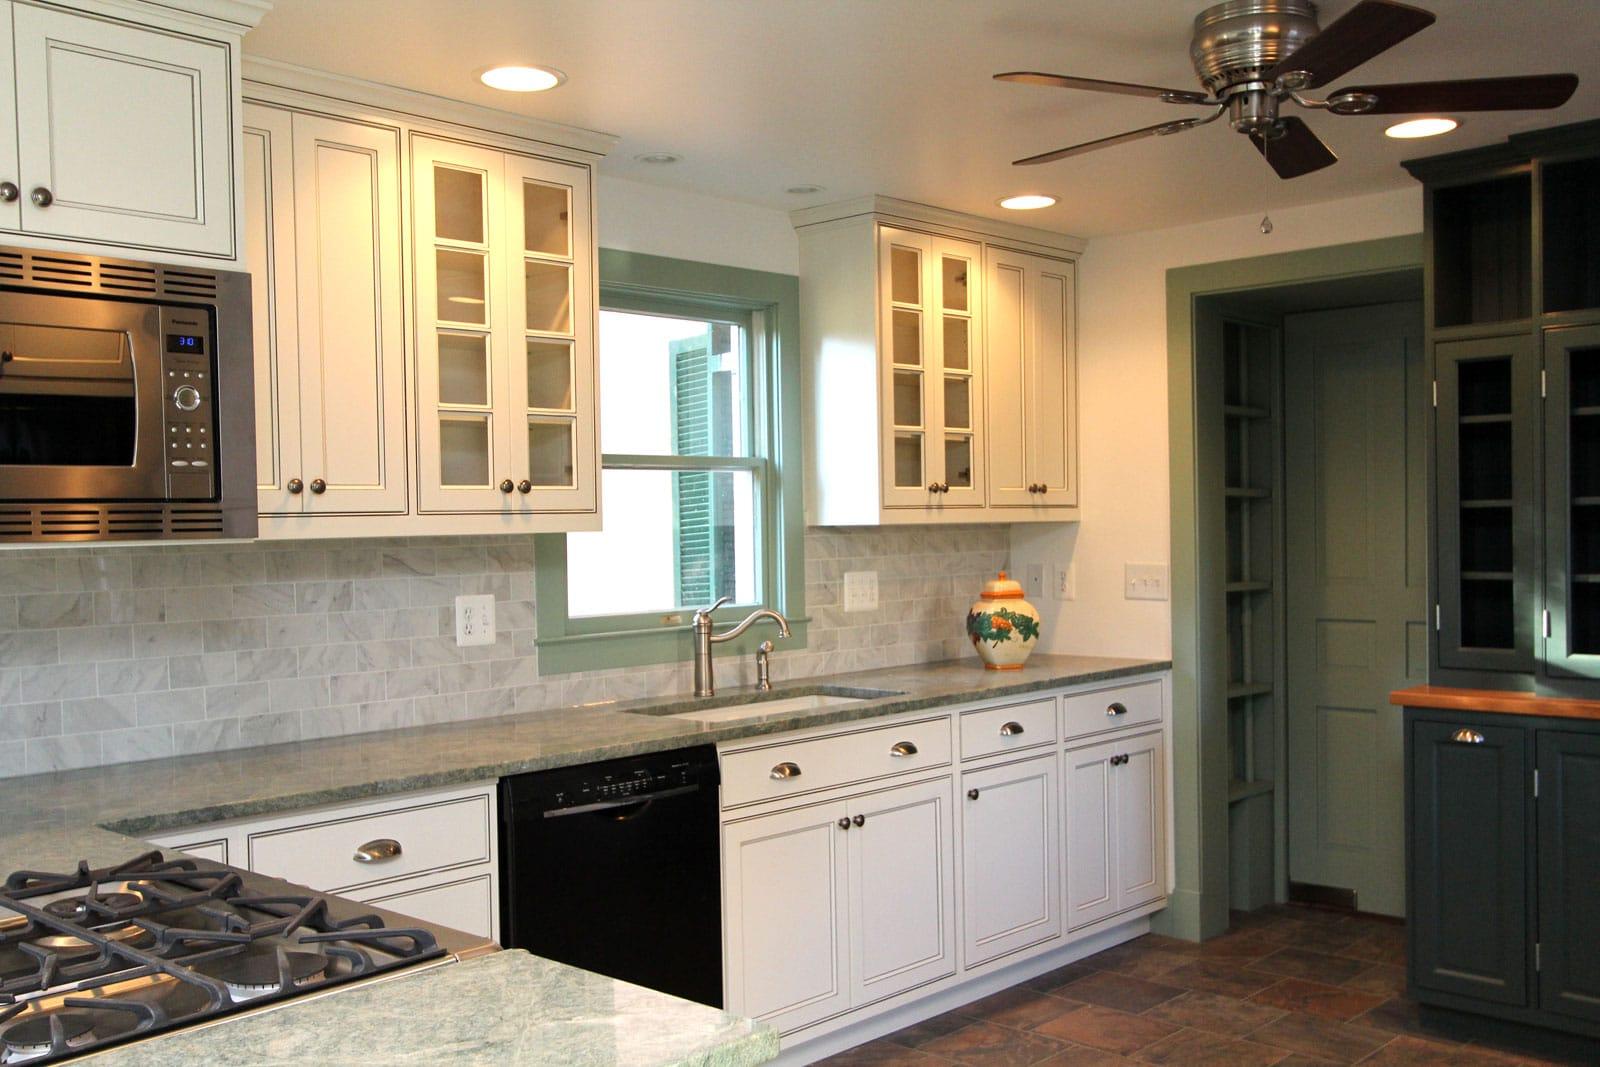 Gorgeous Kitchen Renovation In Potomac Maryland: List Of Services Slide Kitchen Hayes